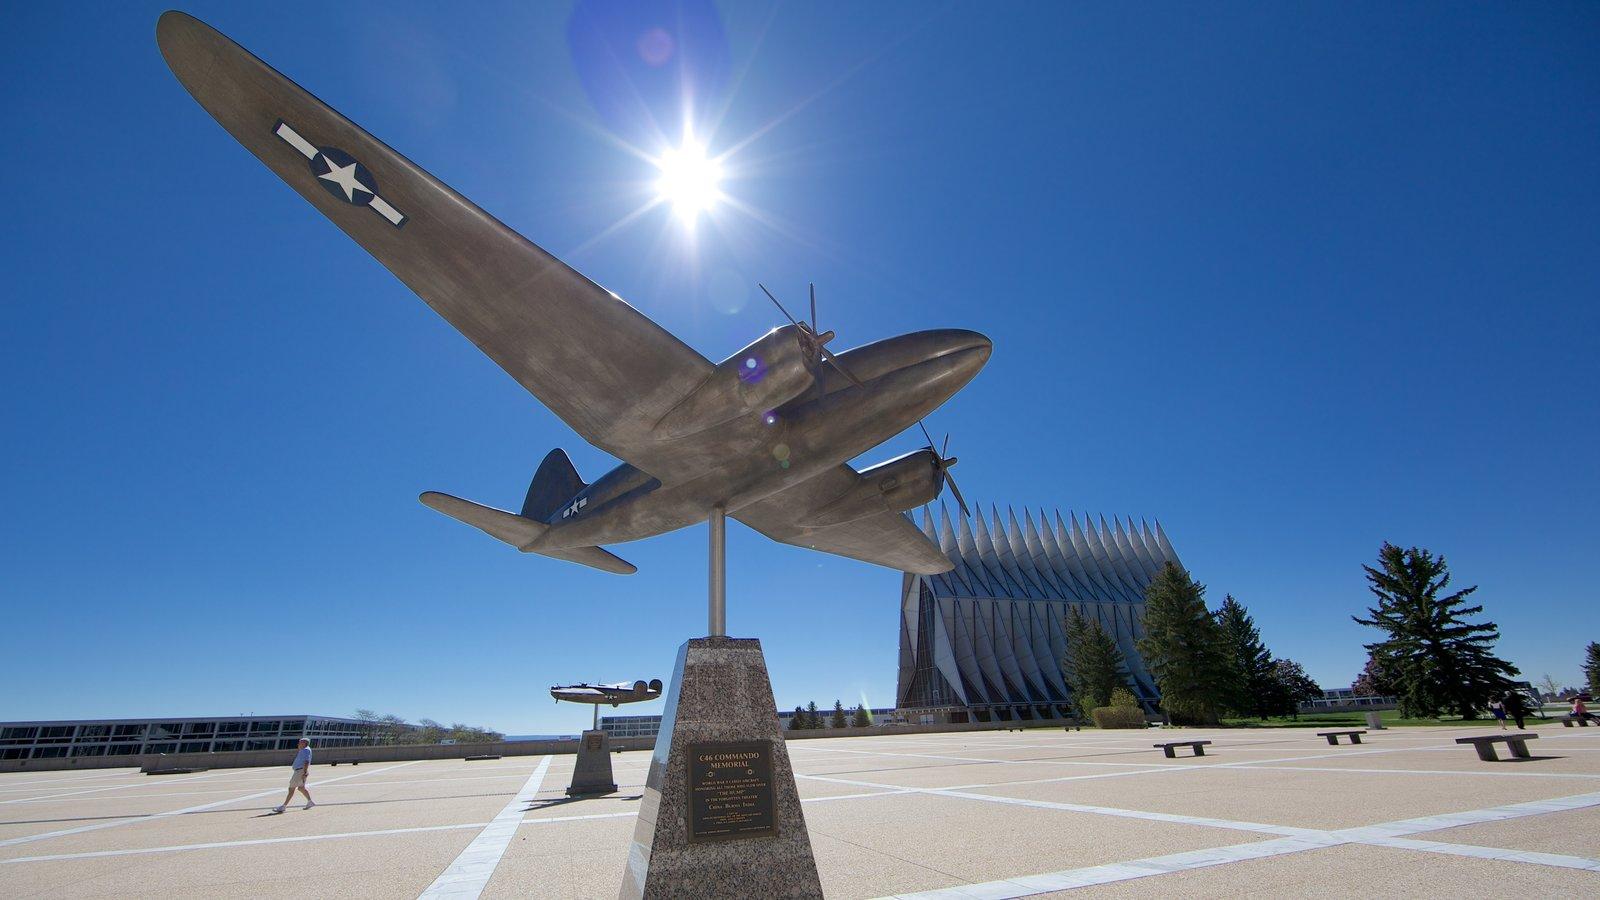 US Air Force Academy caracterizando um monumento e aeronave